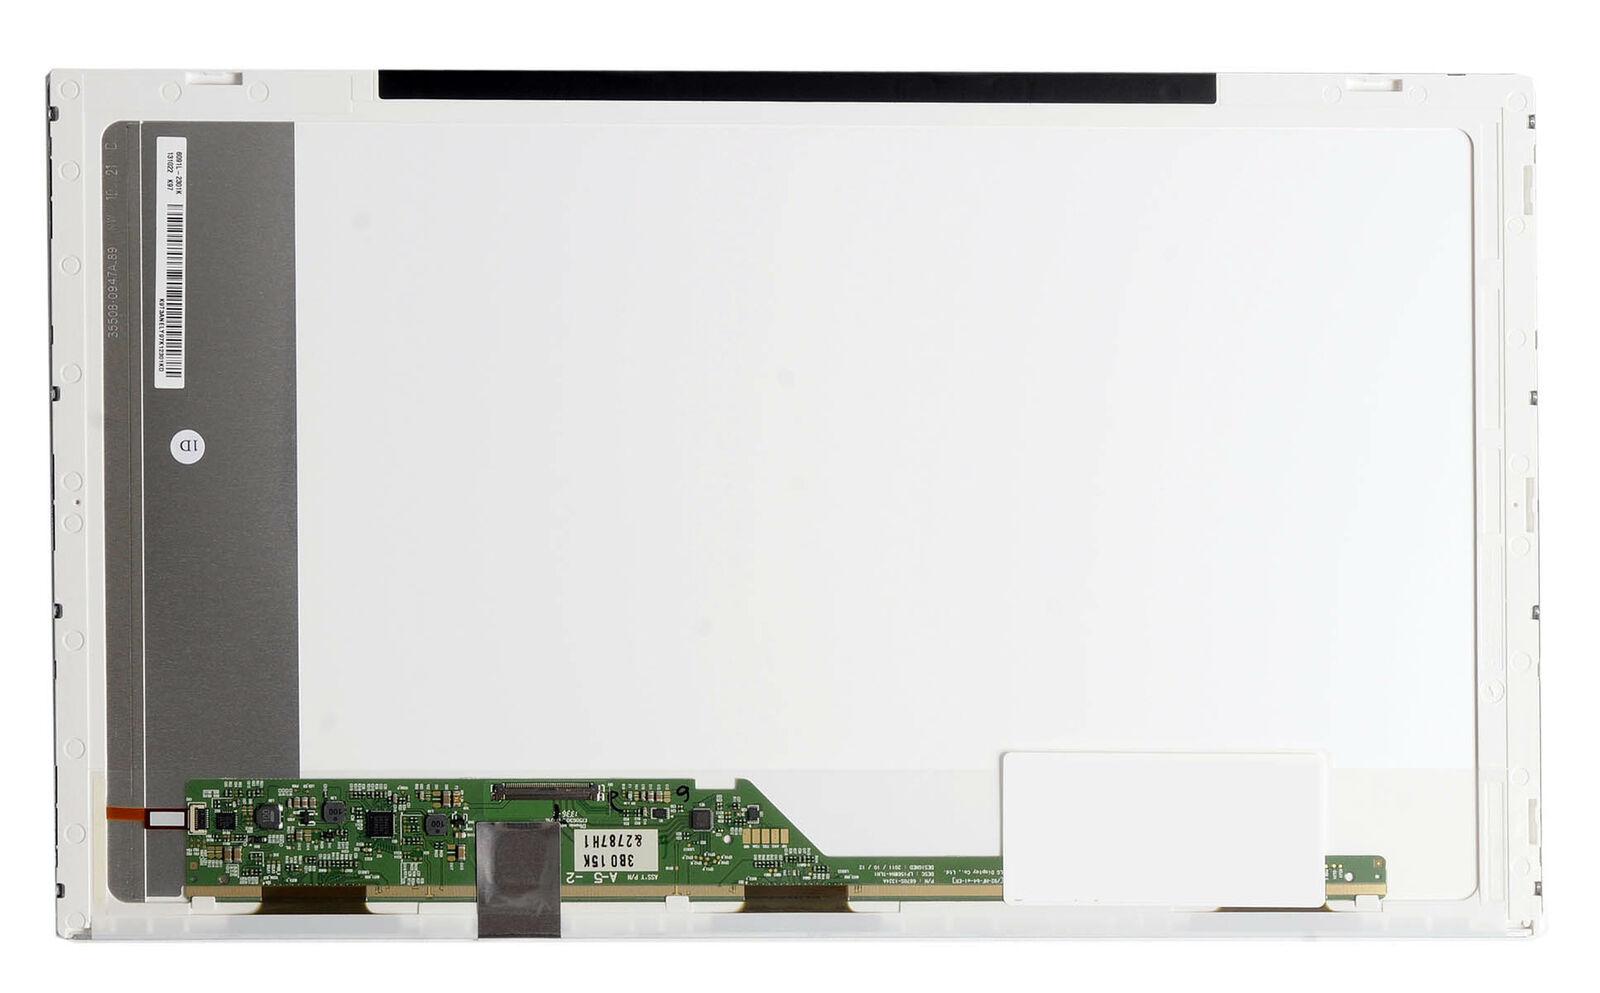 For Sony Vaio Vpcee31Fx Brand New A+ 15.6